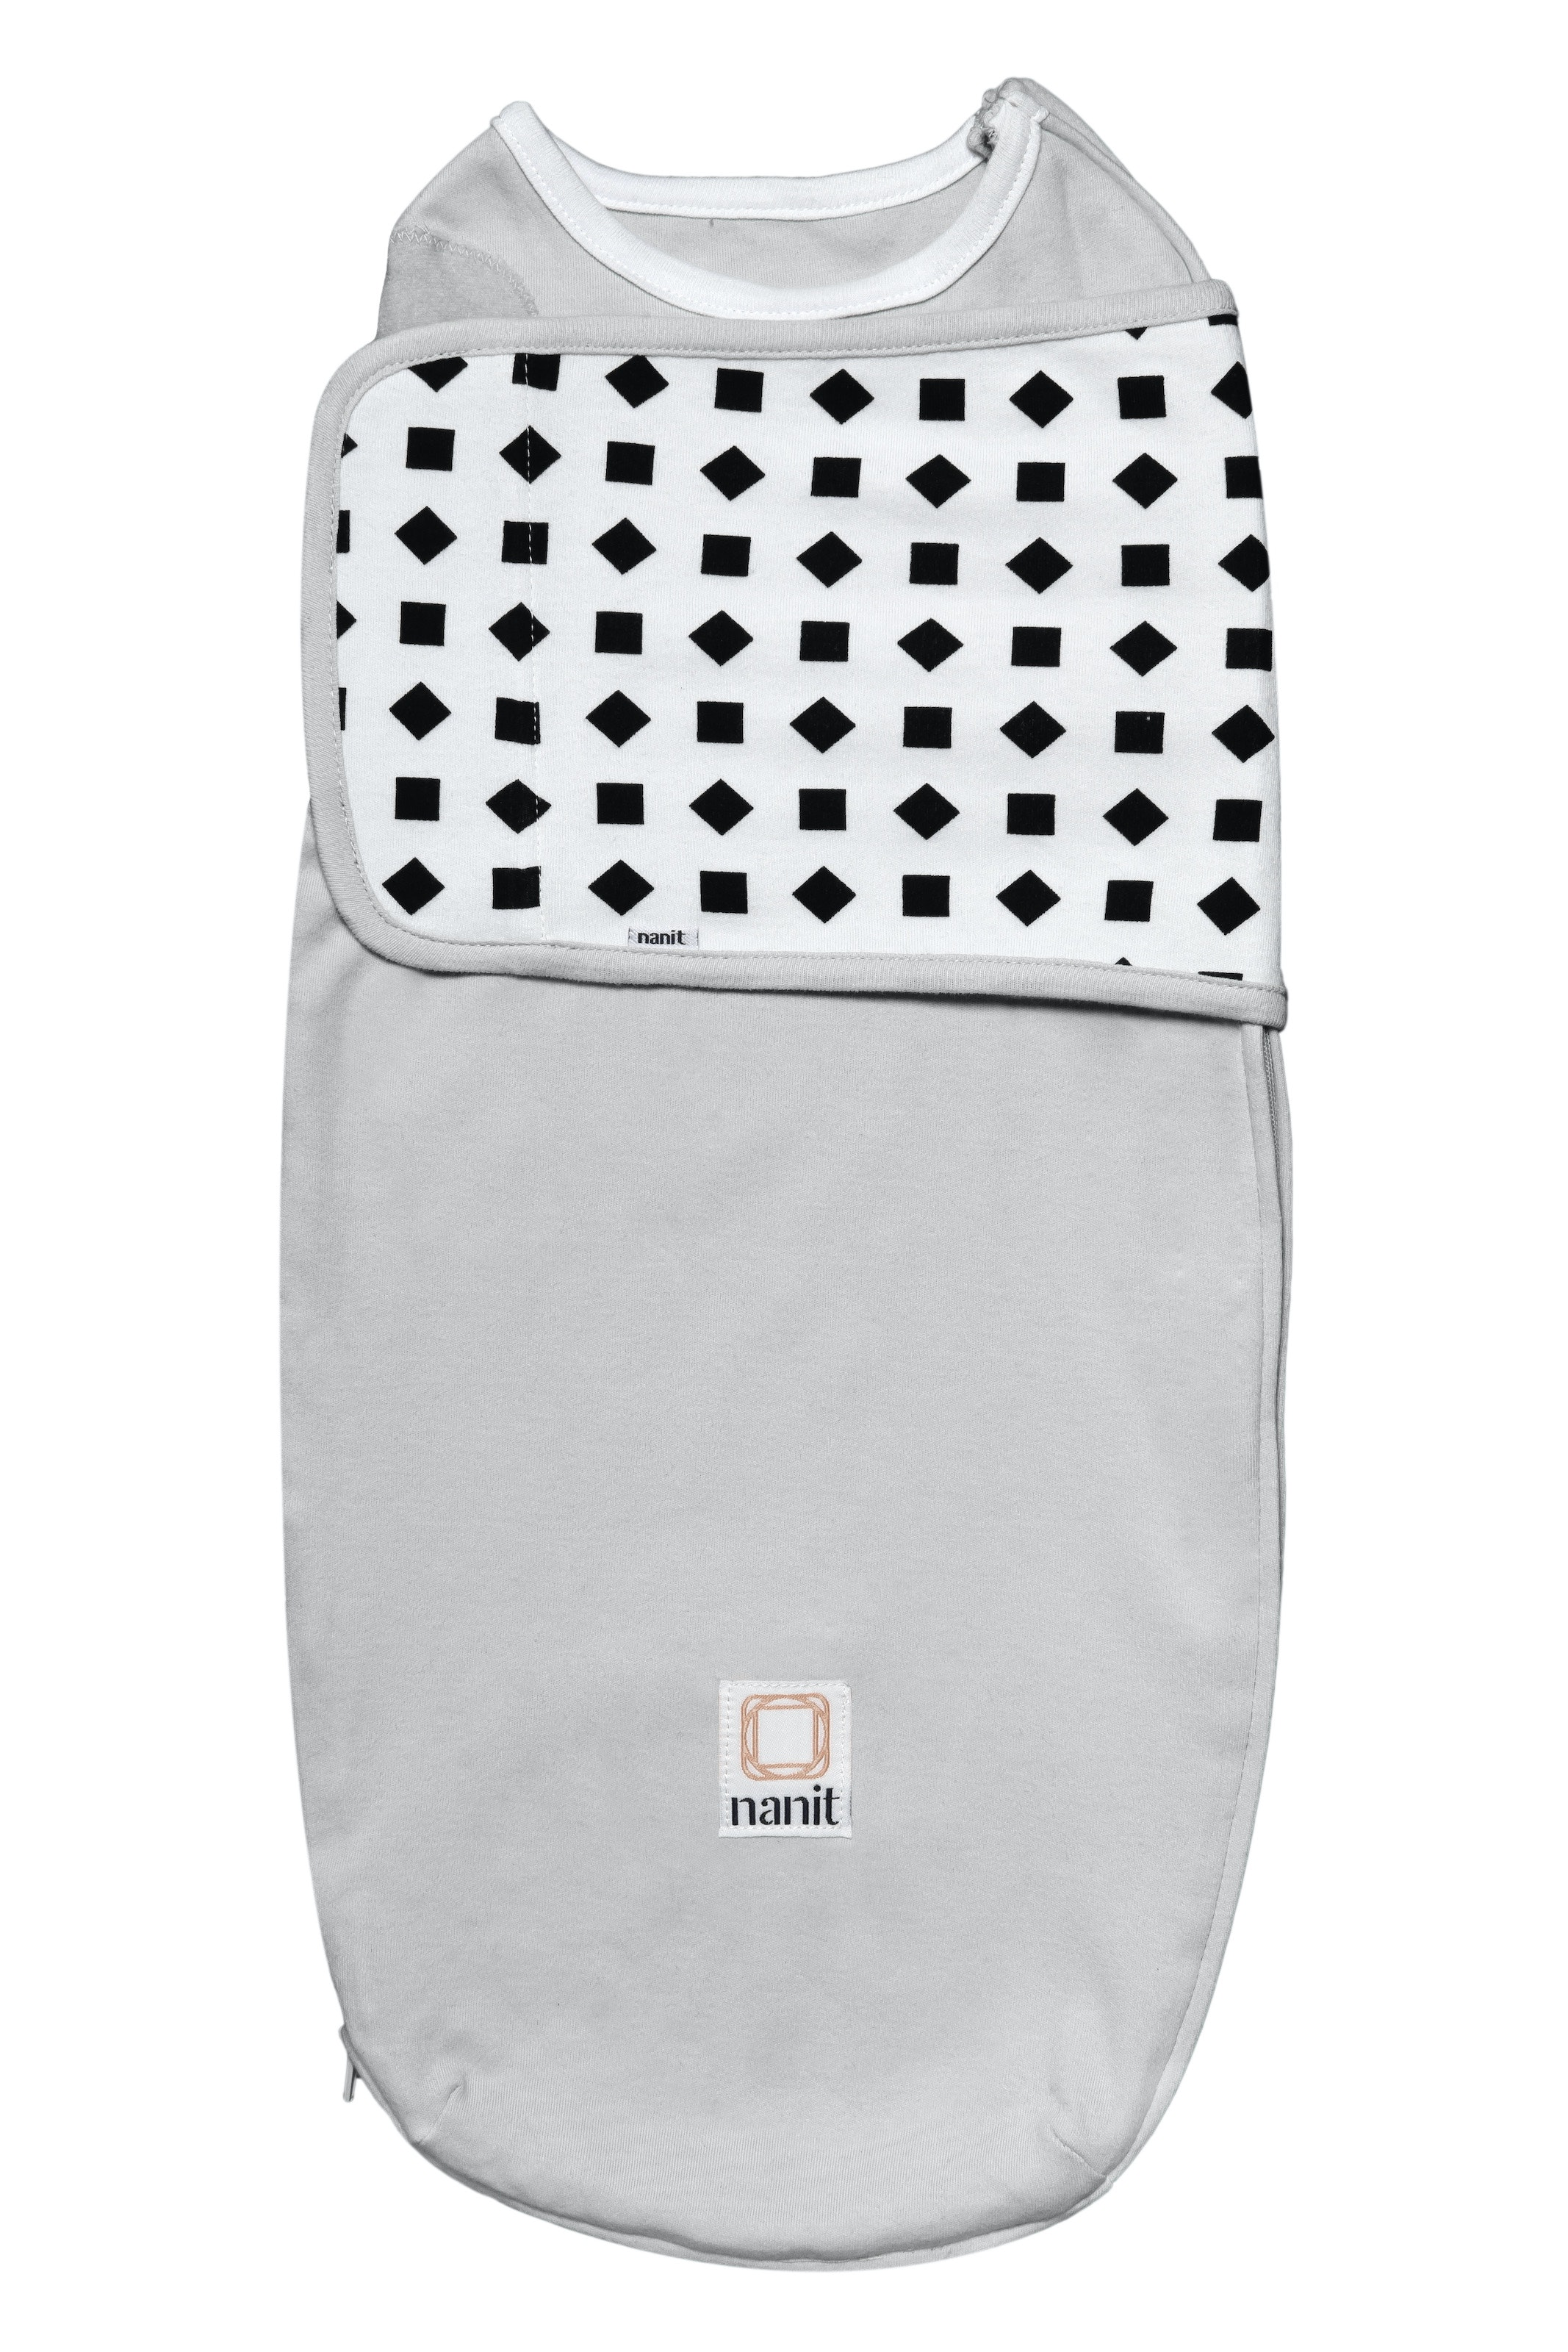 Nanit swaddle 05 large 1pack